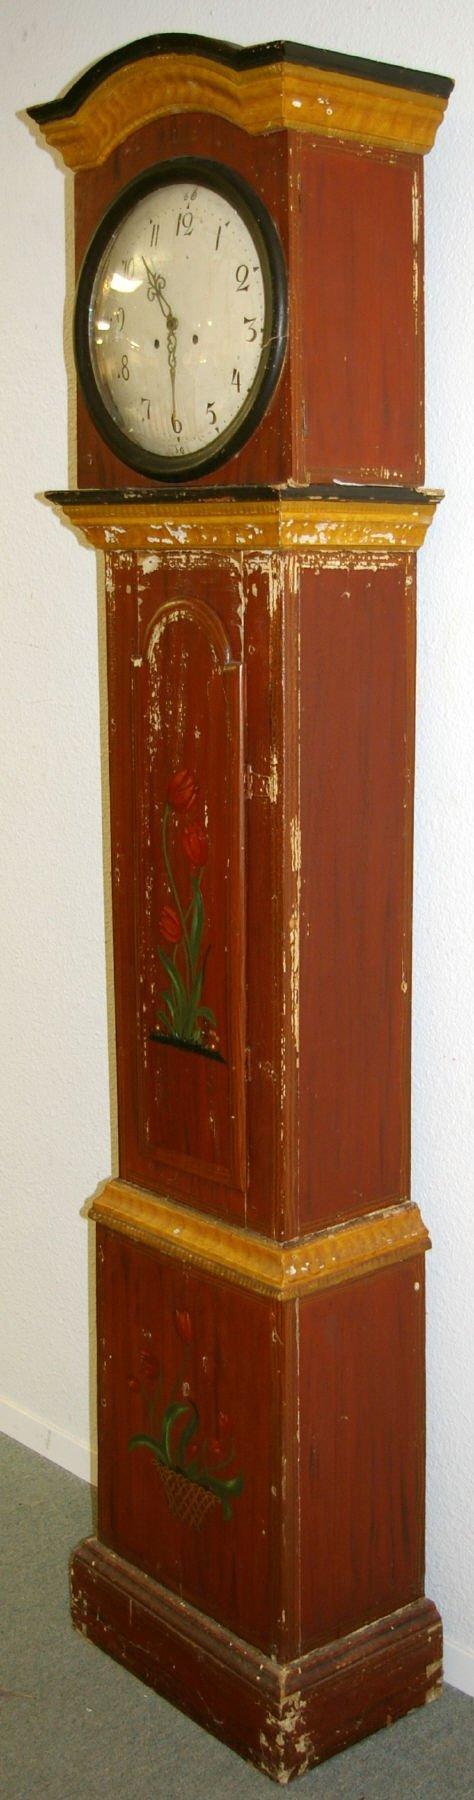 1193: Primitive Folk Art Hand Painted Grandfather Clock - 6